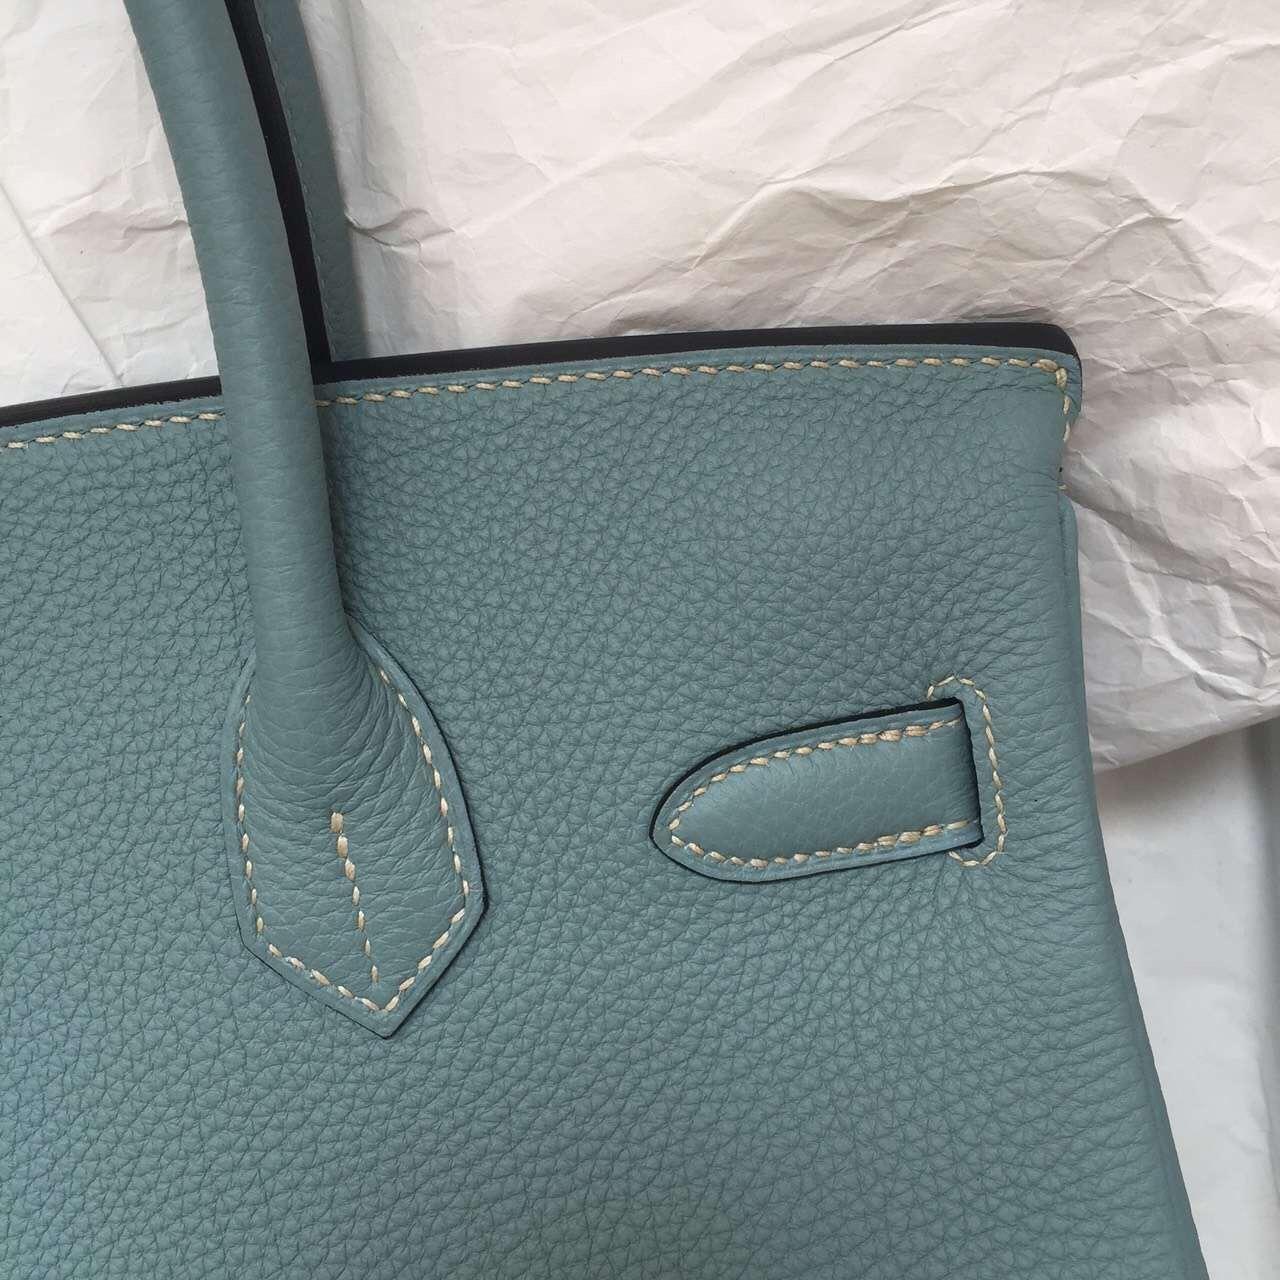 Wholesale Hermes Birkin Bag New Blue Lin Togo Leather Ladies' Tote Bag 30cm